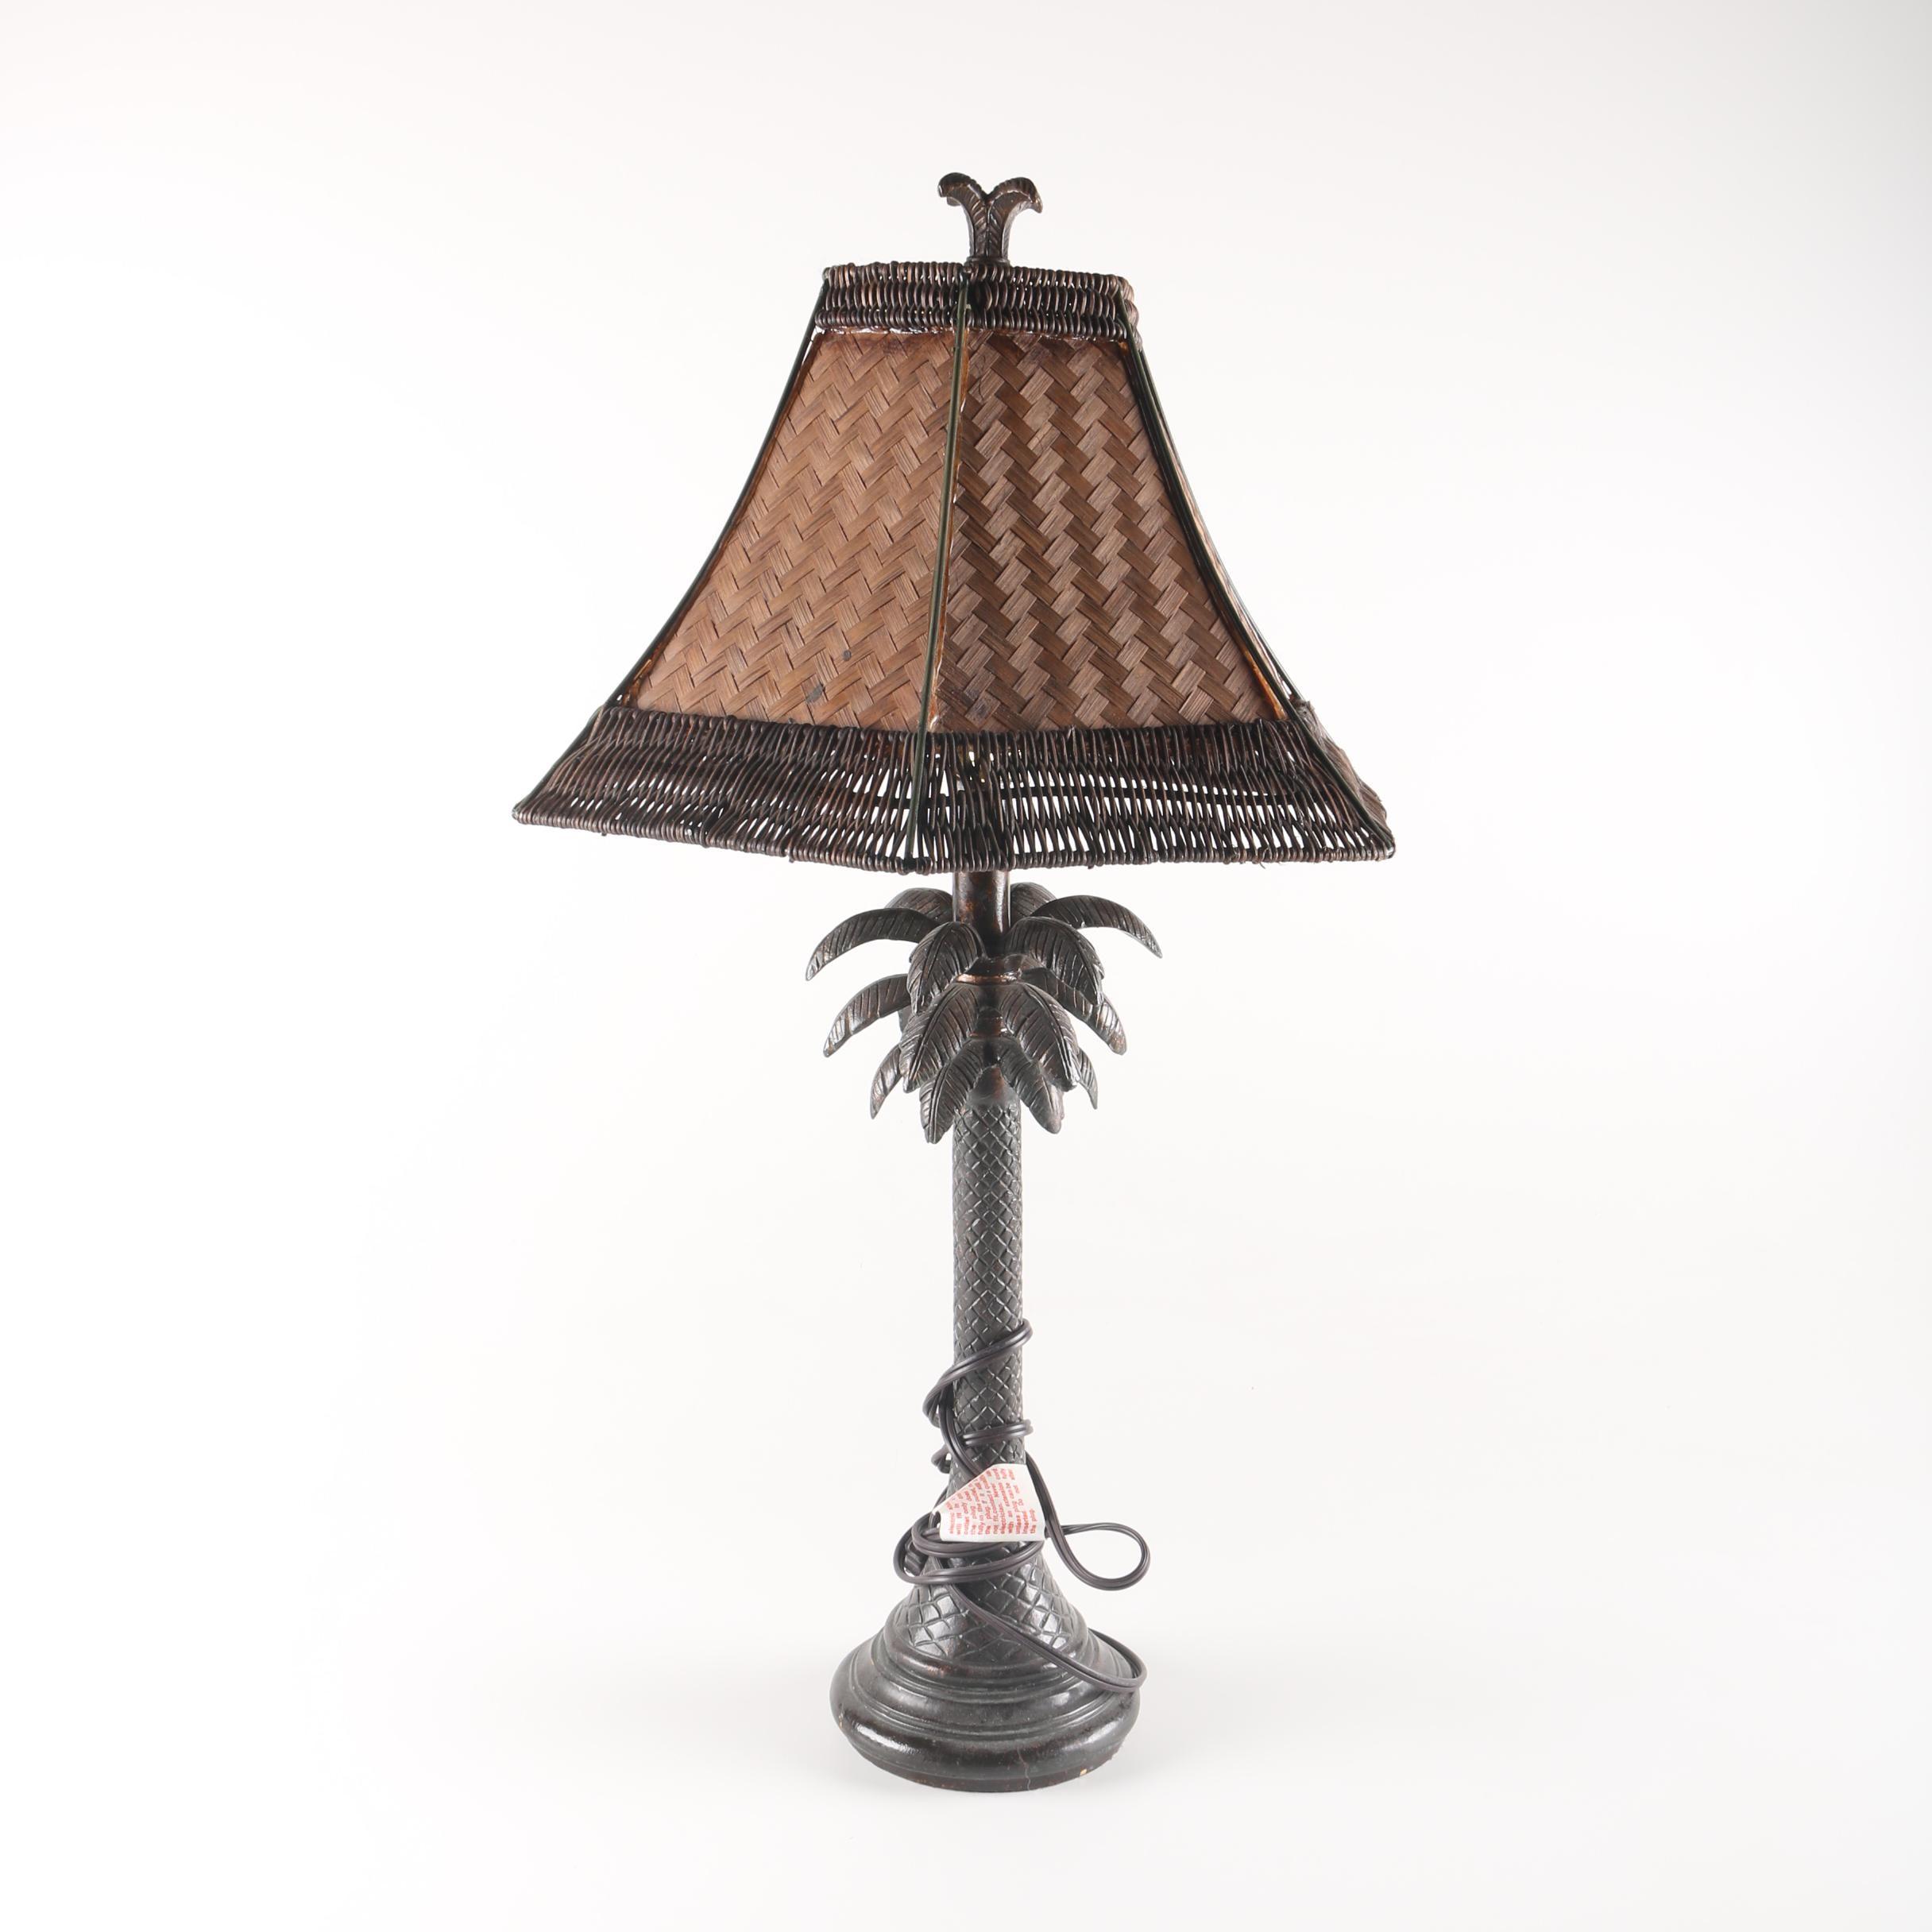 Rattan Palm Tree Table Lamp